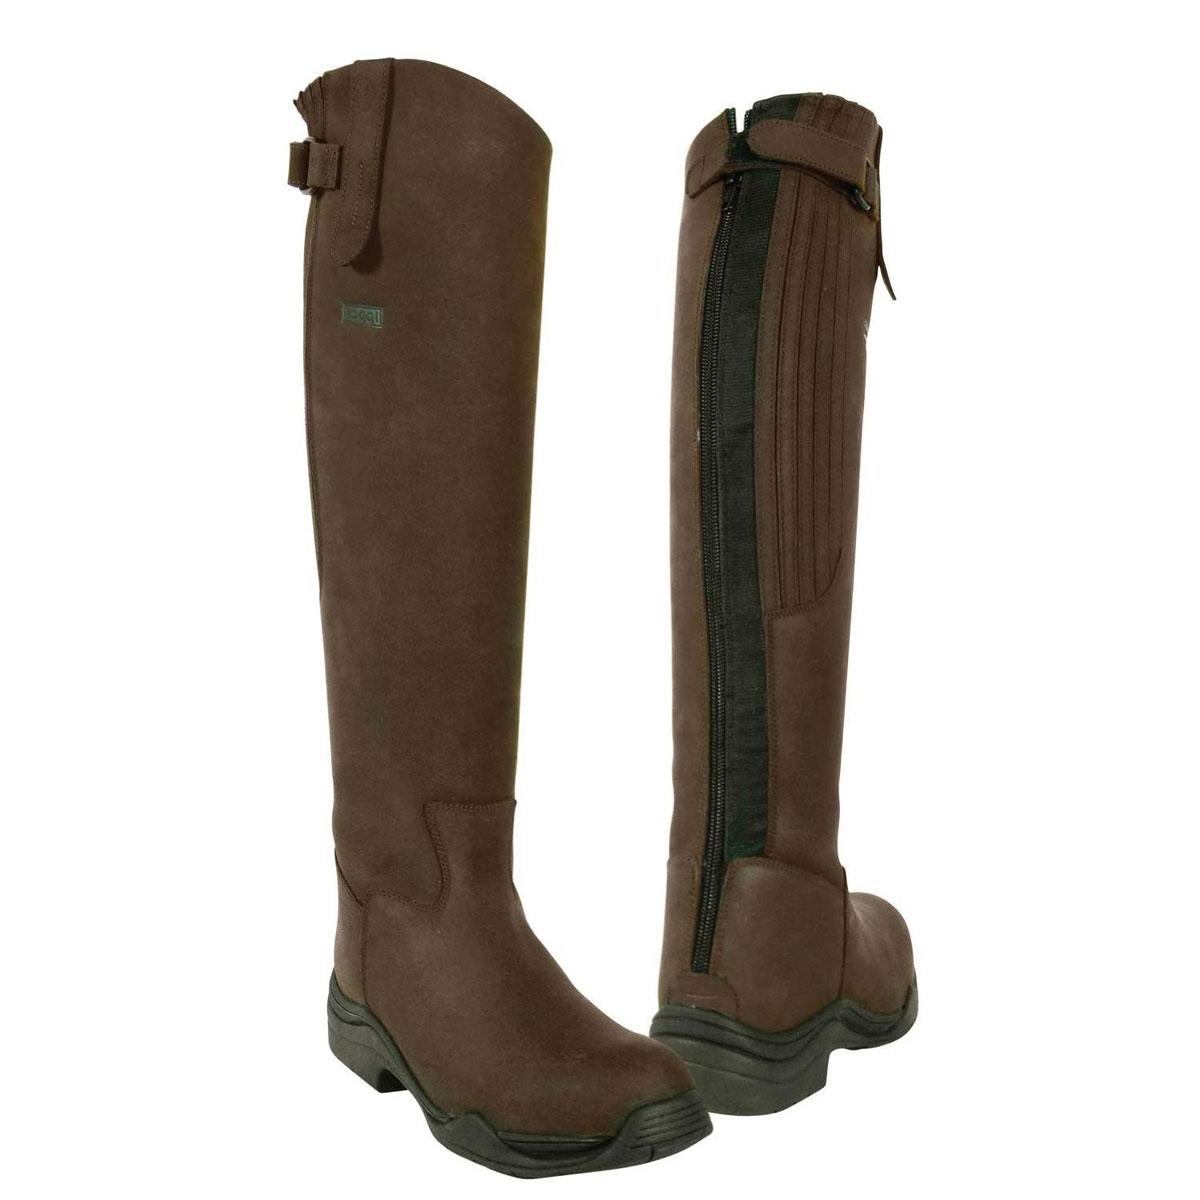 Toggi Calgary Riding Boots Women S Checco Uttings Co Uk